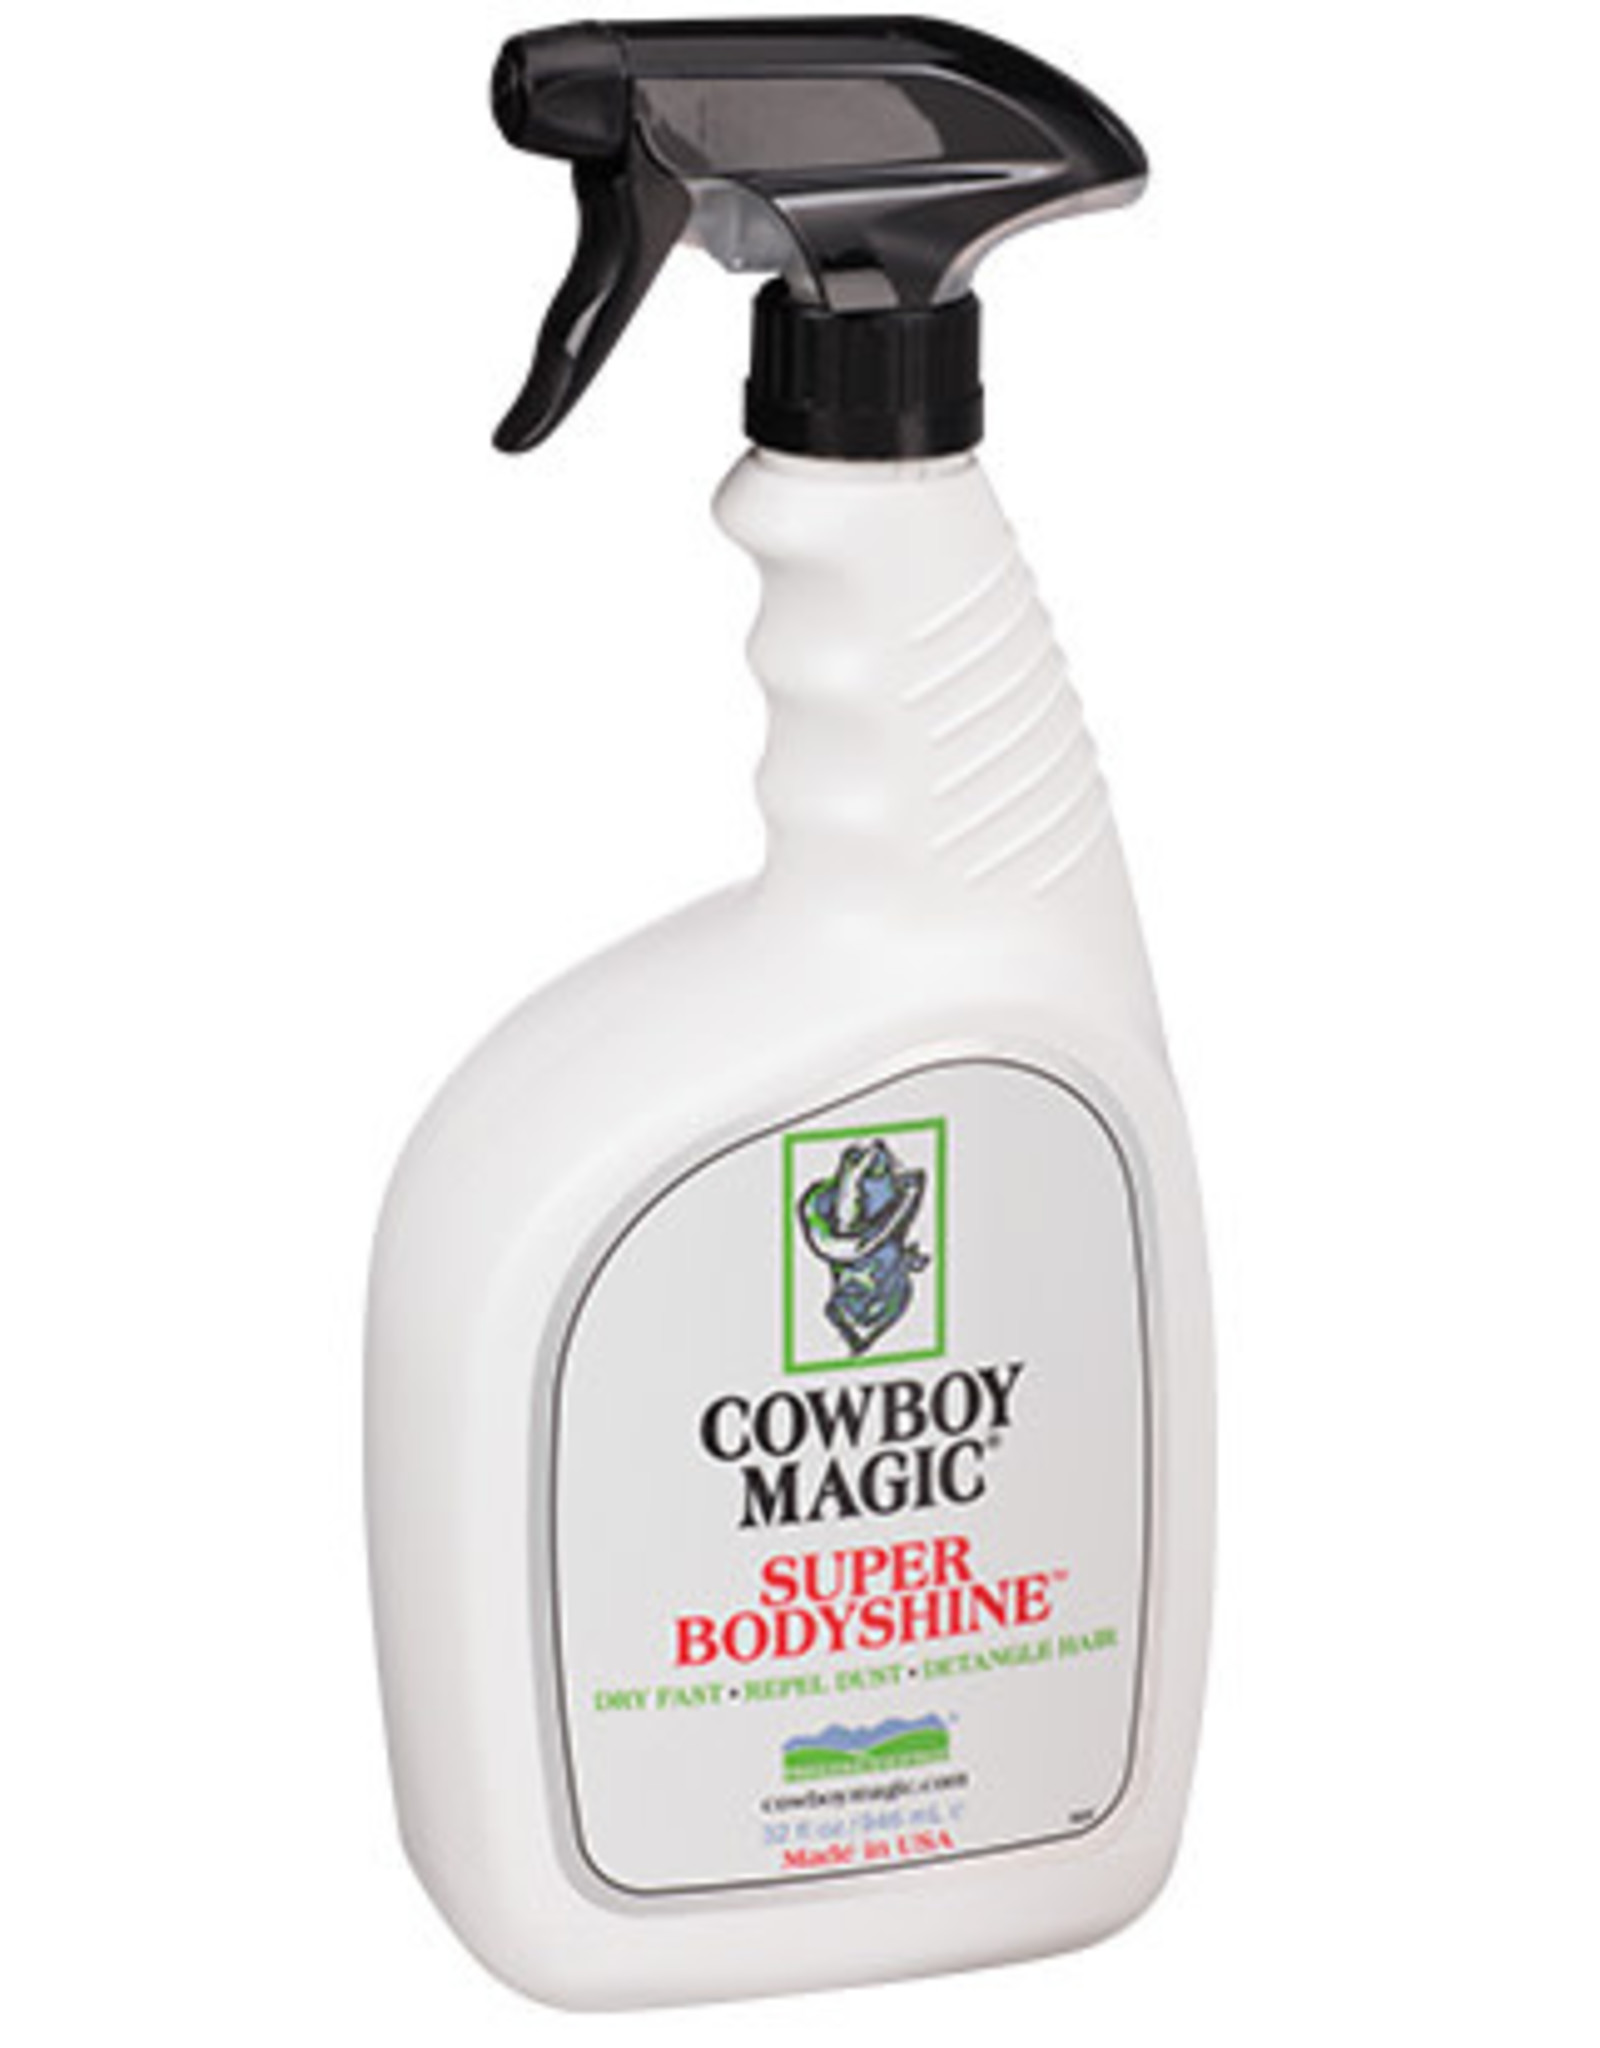 Cowboy Magic Cowboy Magic Super Bodyshine 32oz